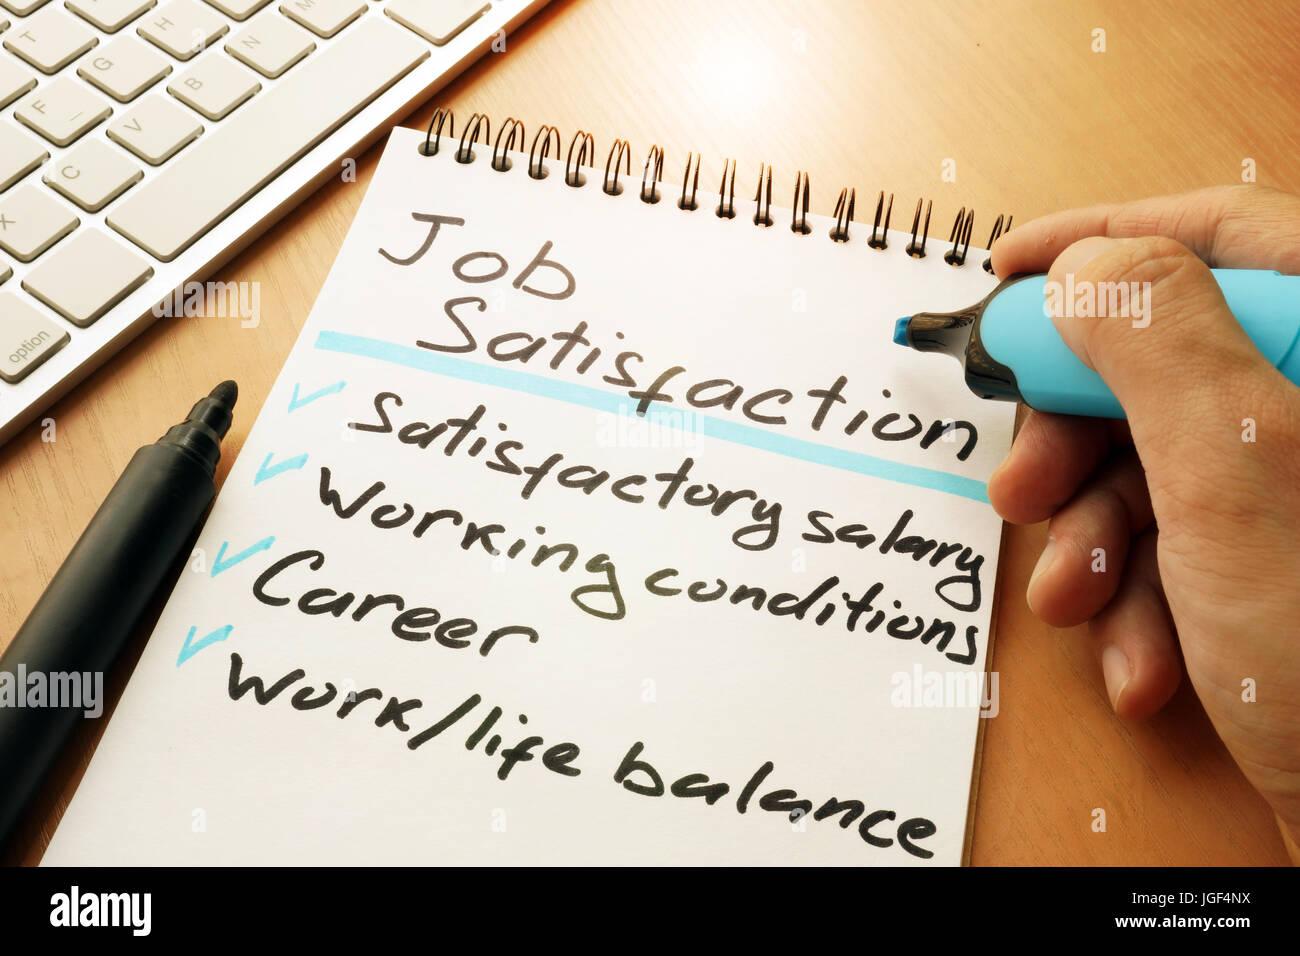 Job satisfaction list written by hand. Stock Photo